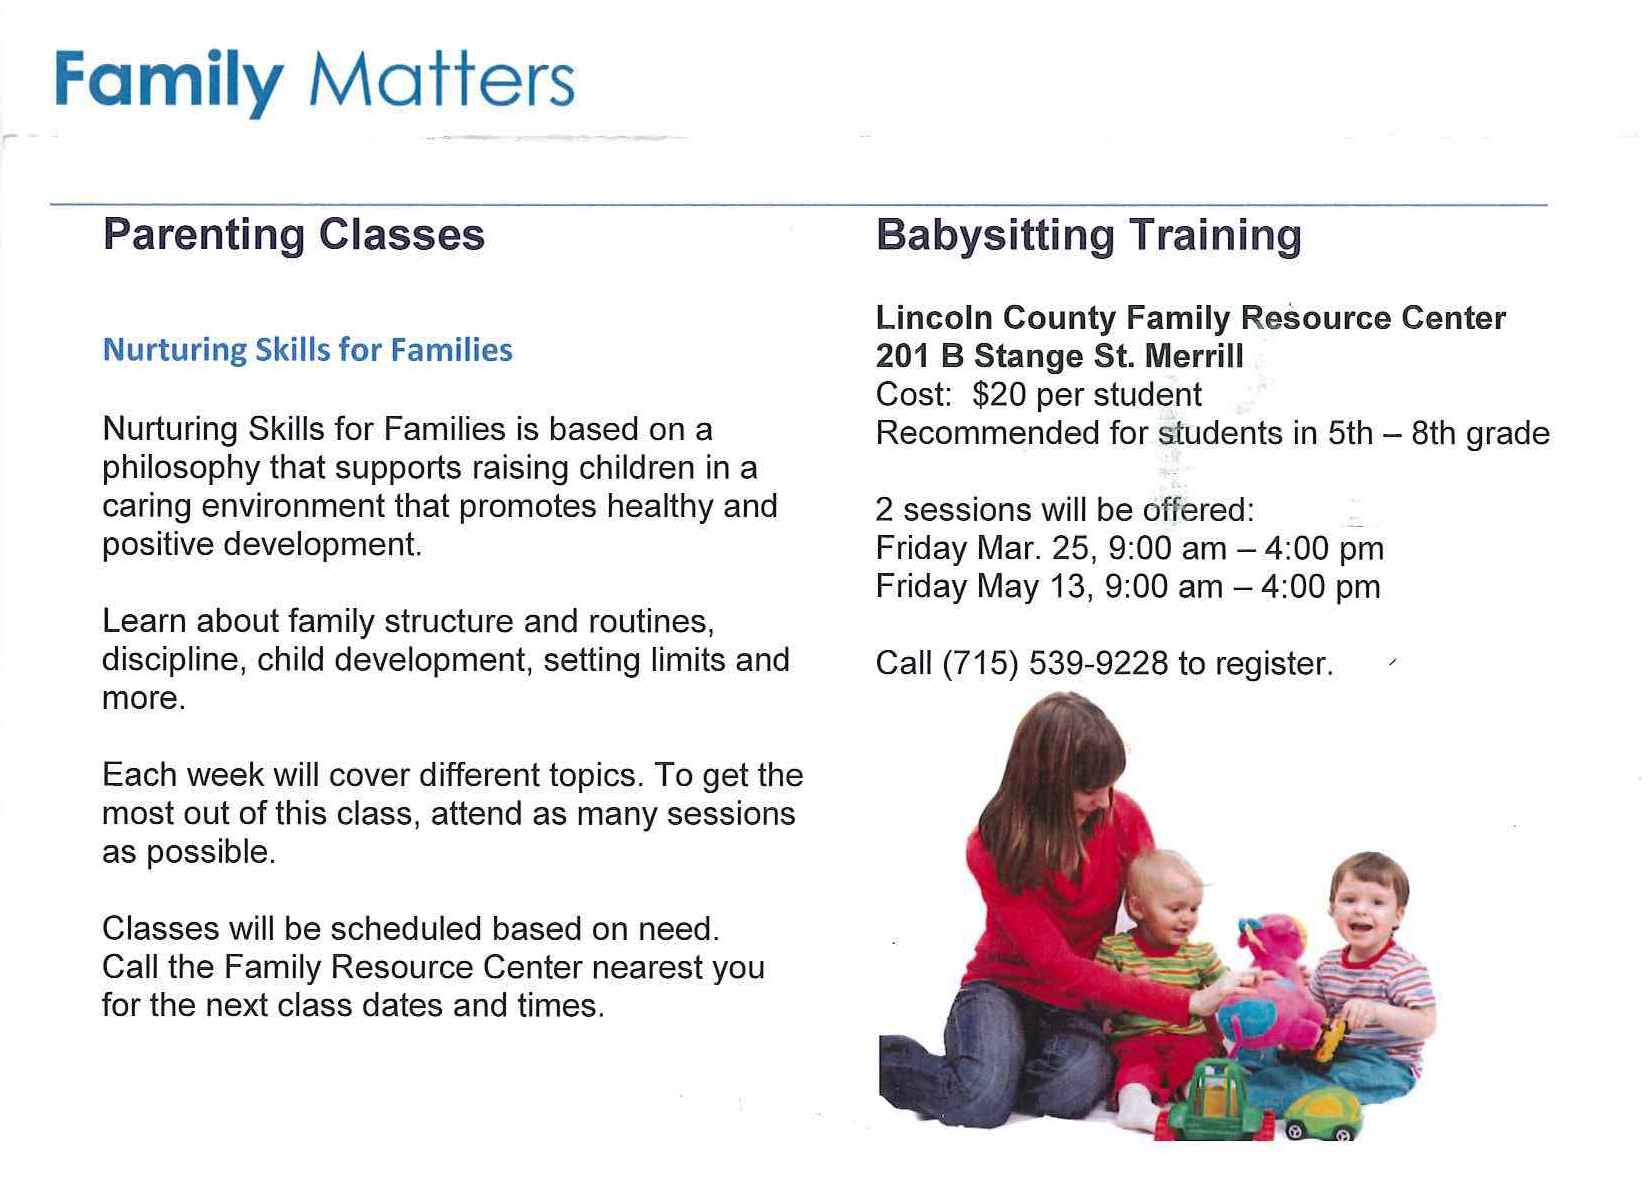 20151228124507715_0005  Babysitting Skills